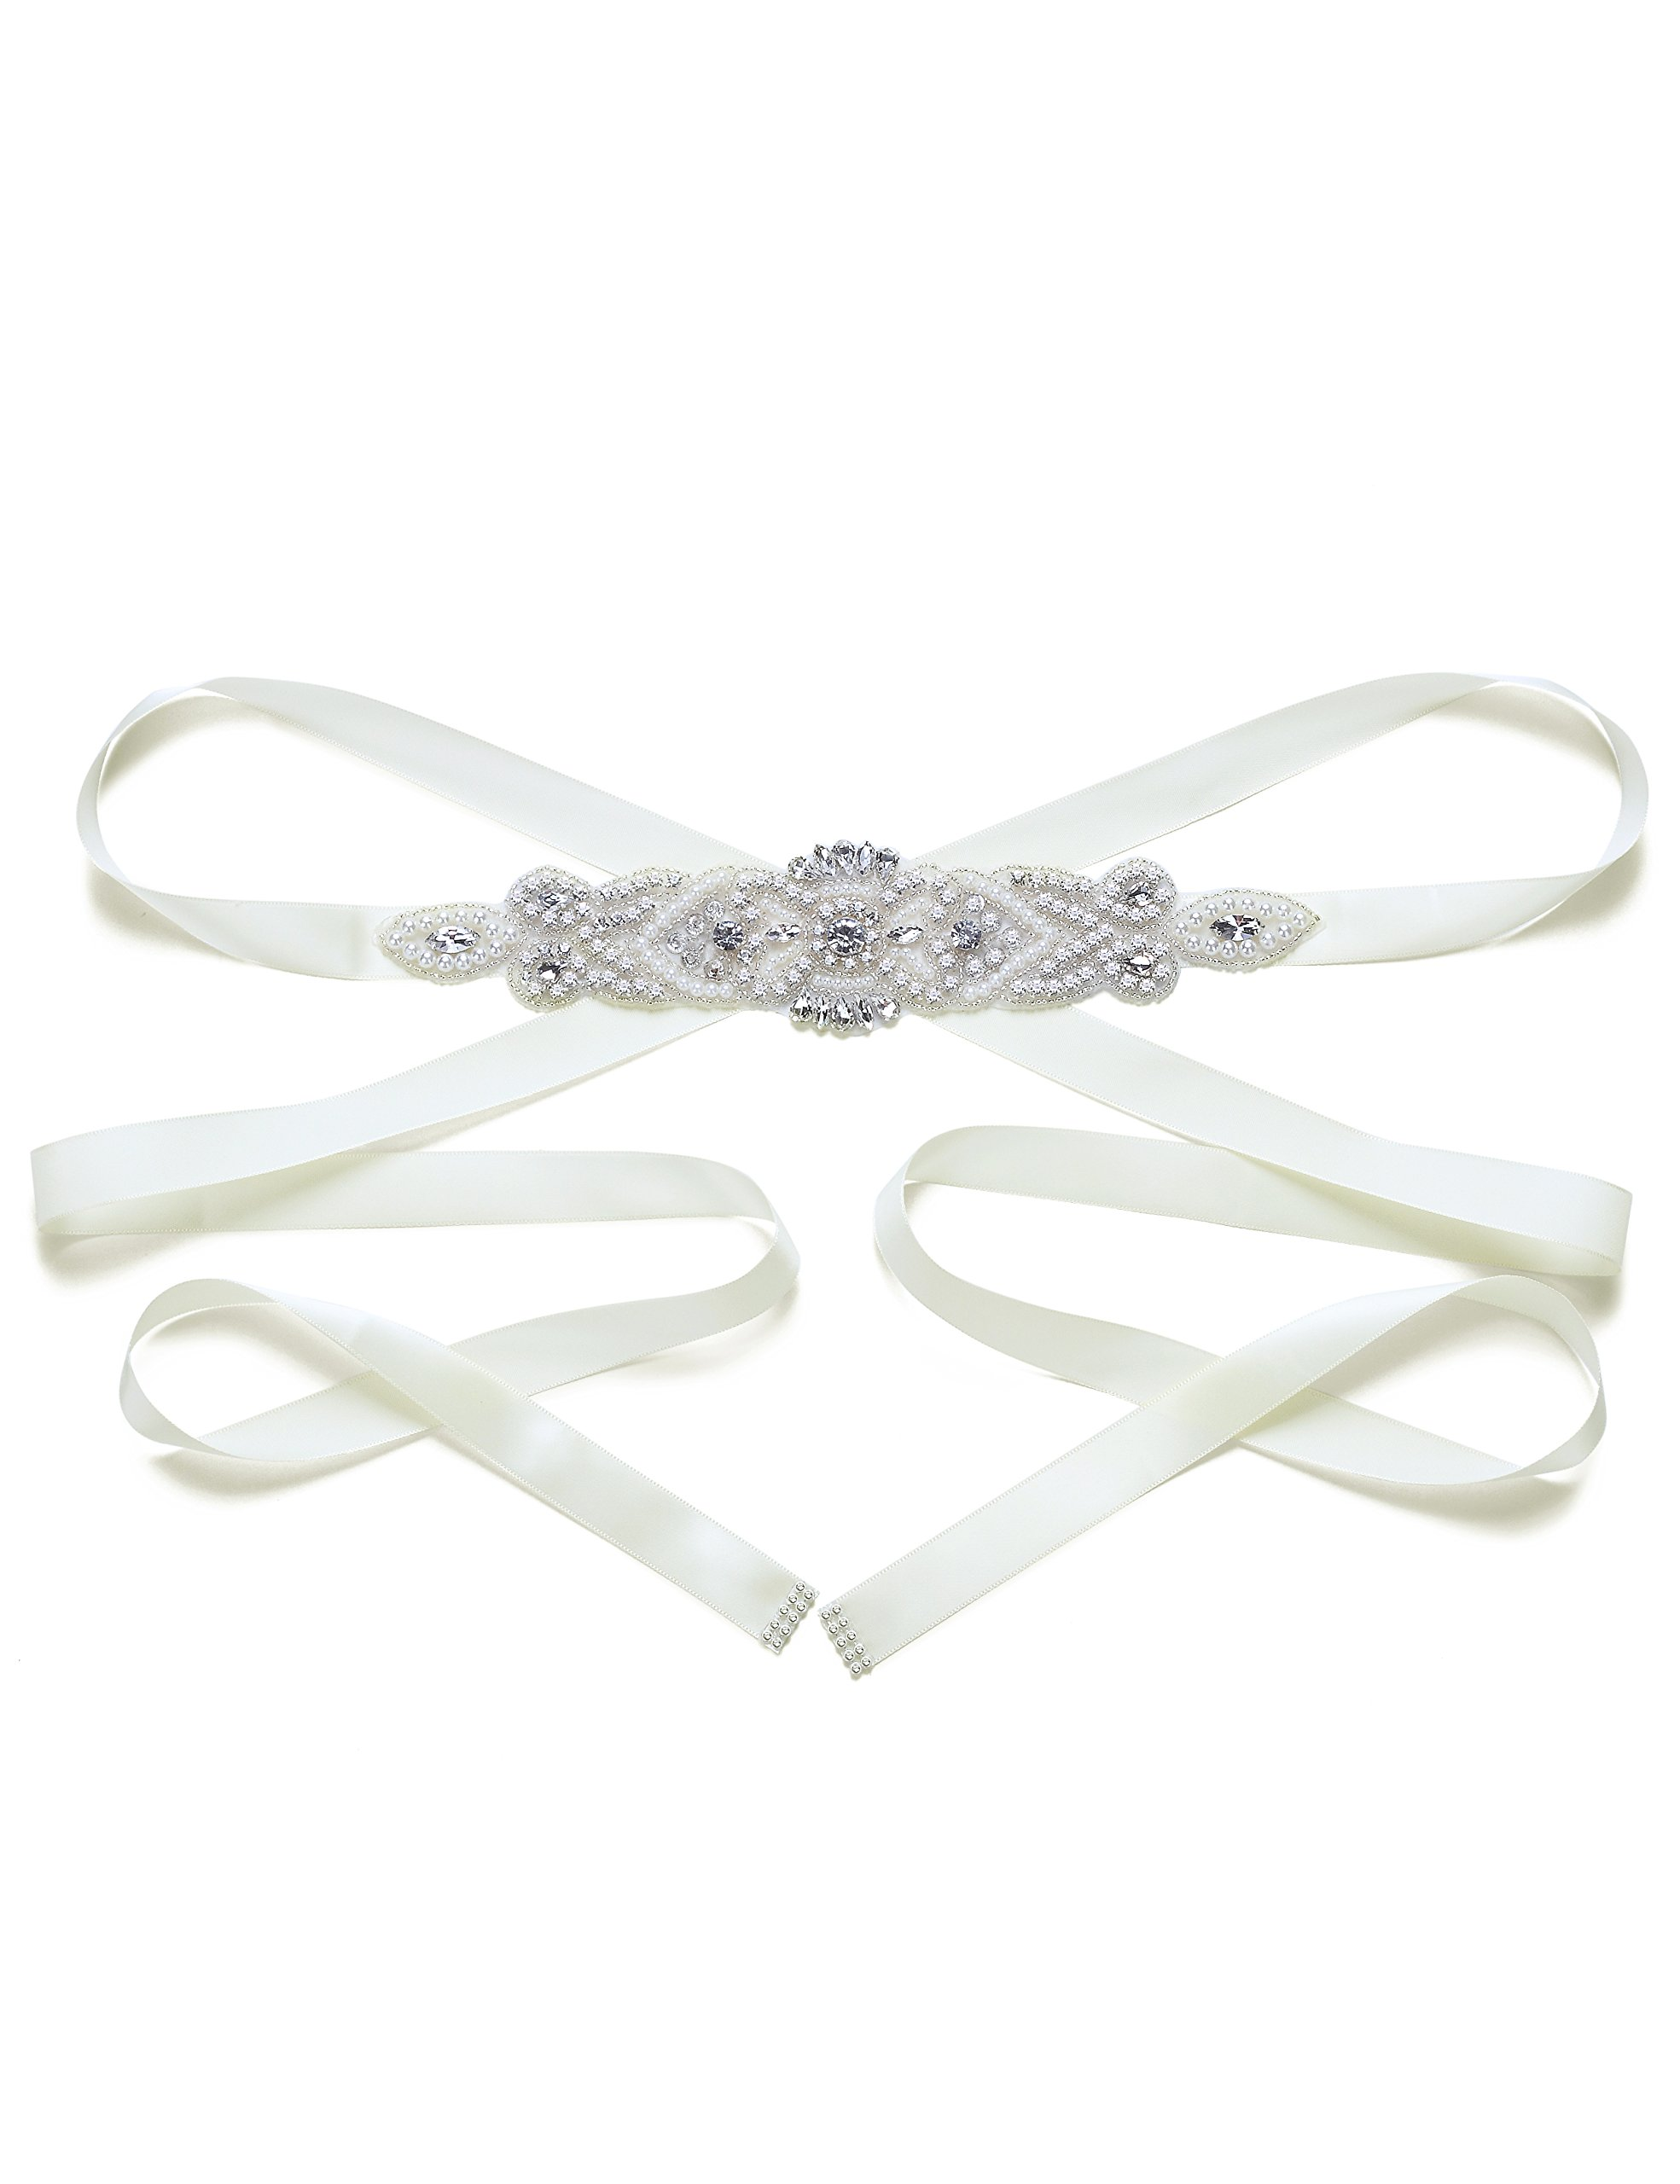 Bride Rhinestone Wedding Belt Multi - color optional diamond wedding belt (Off-white Color)